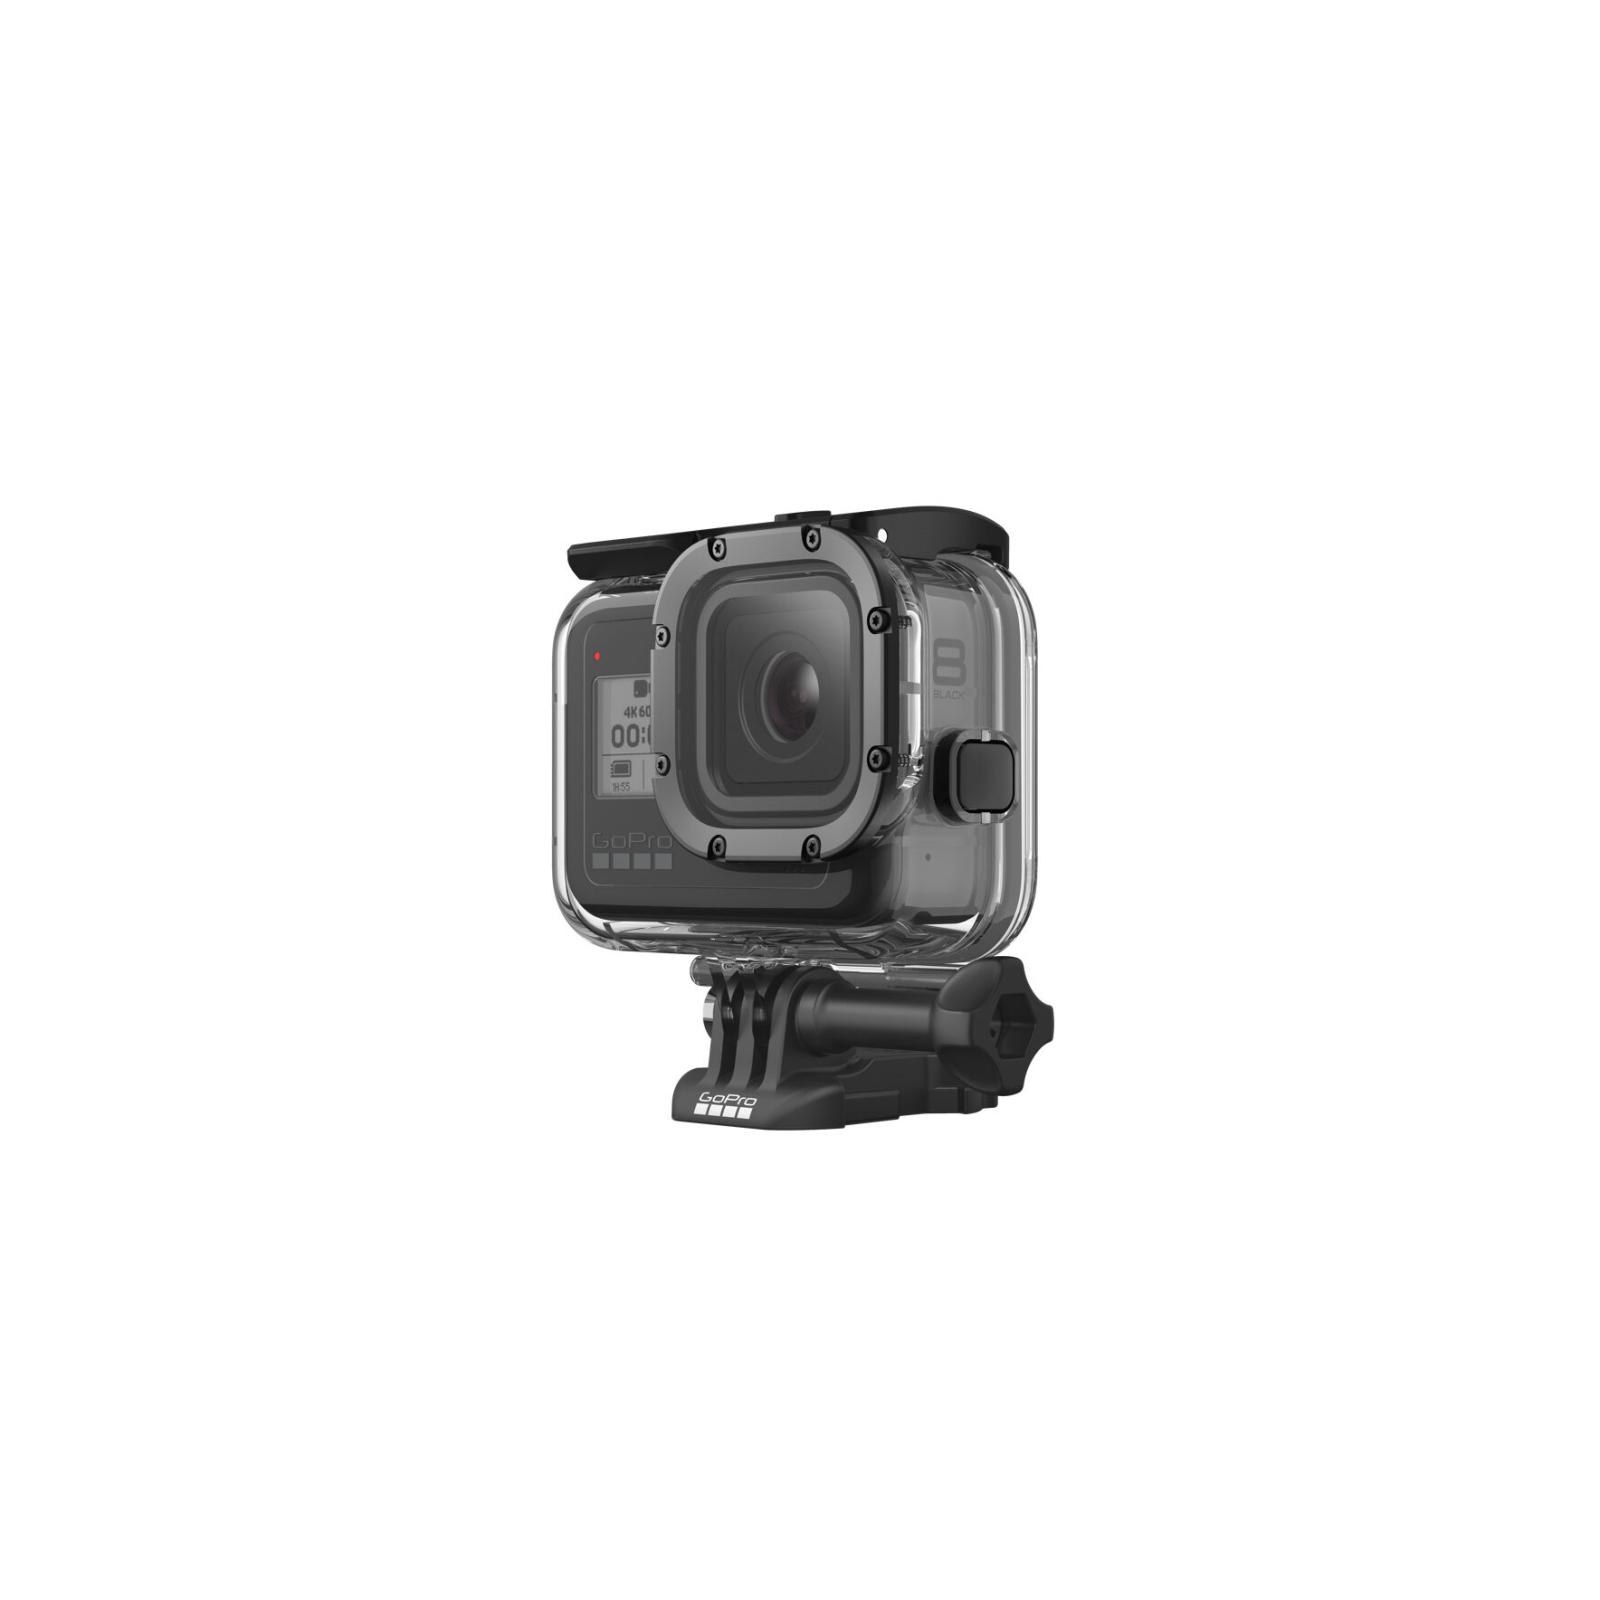 Аксессуар к экшн-камерам GoPro Super Suit Dive Housing forHERO8 Black (AJDIV-001) изображение 2